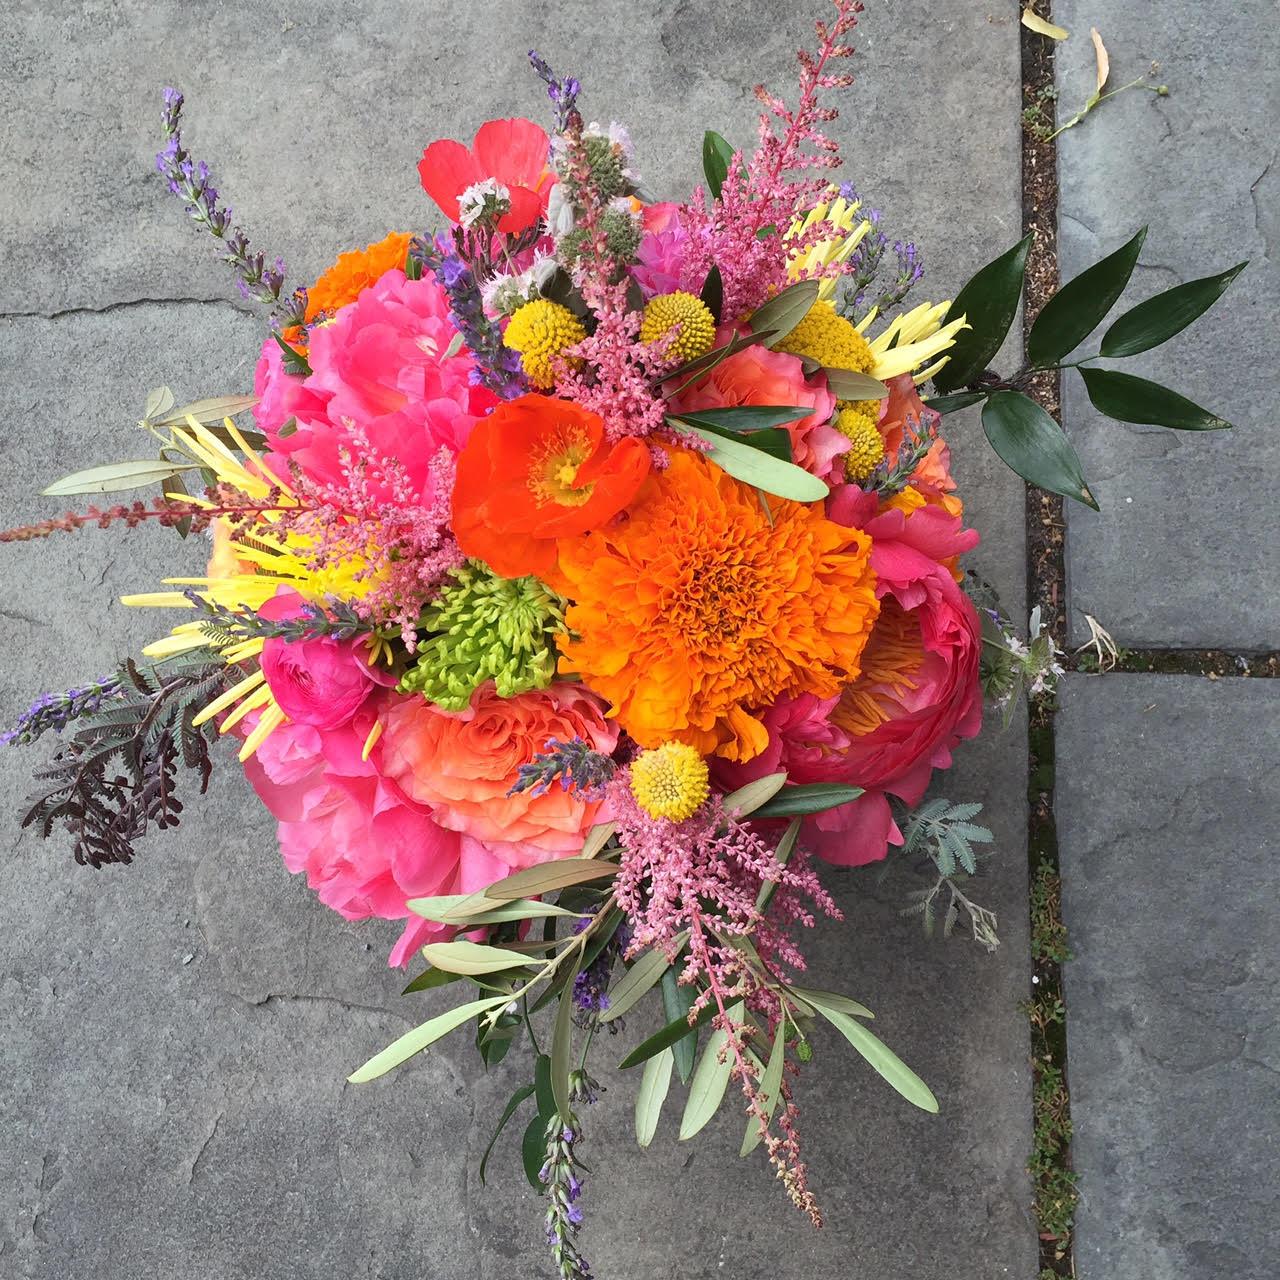 Colorful Bridal Bouquet For A Santa Fe Themed Wedding Marigolds Poppies Astilbe Craspedia Mums Colorful Bridal Bouquet Coral Charm Peony Marigold Wedding